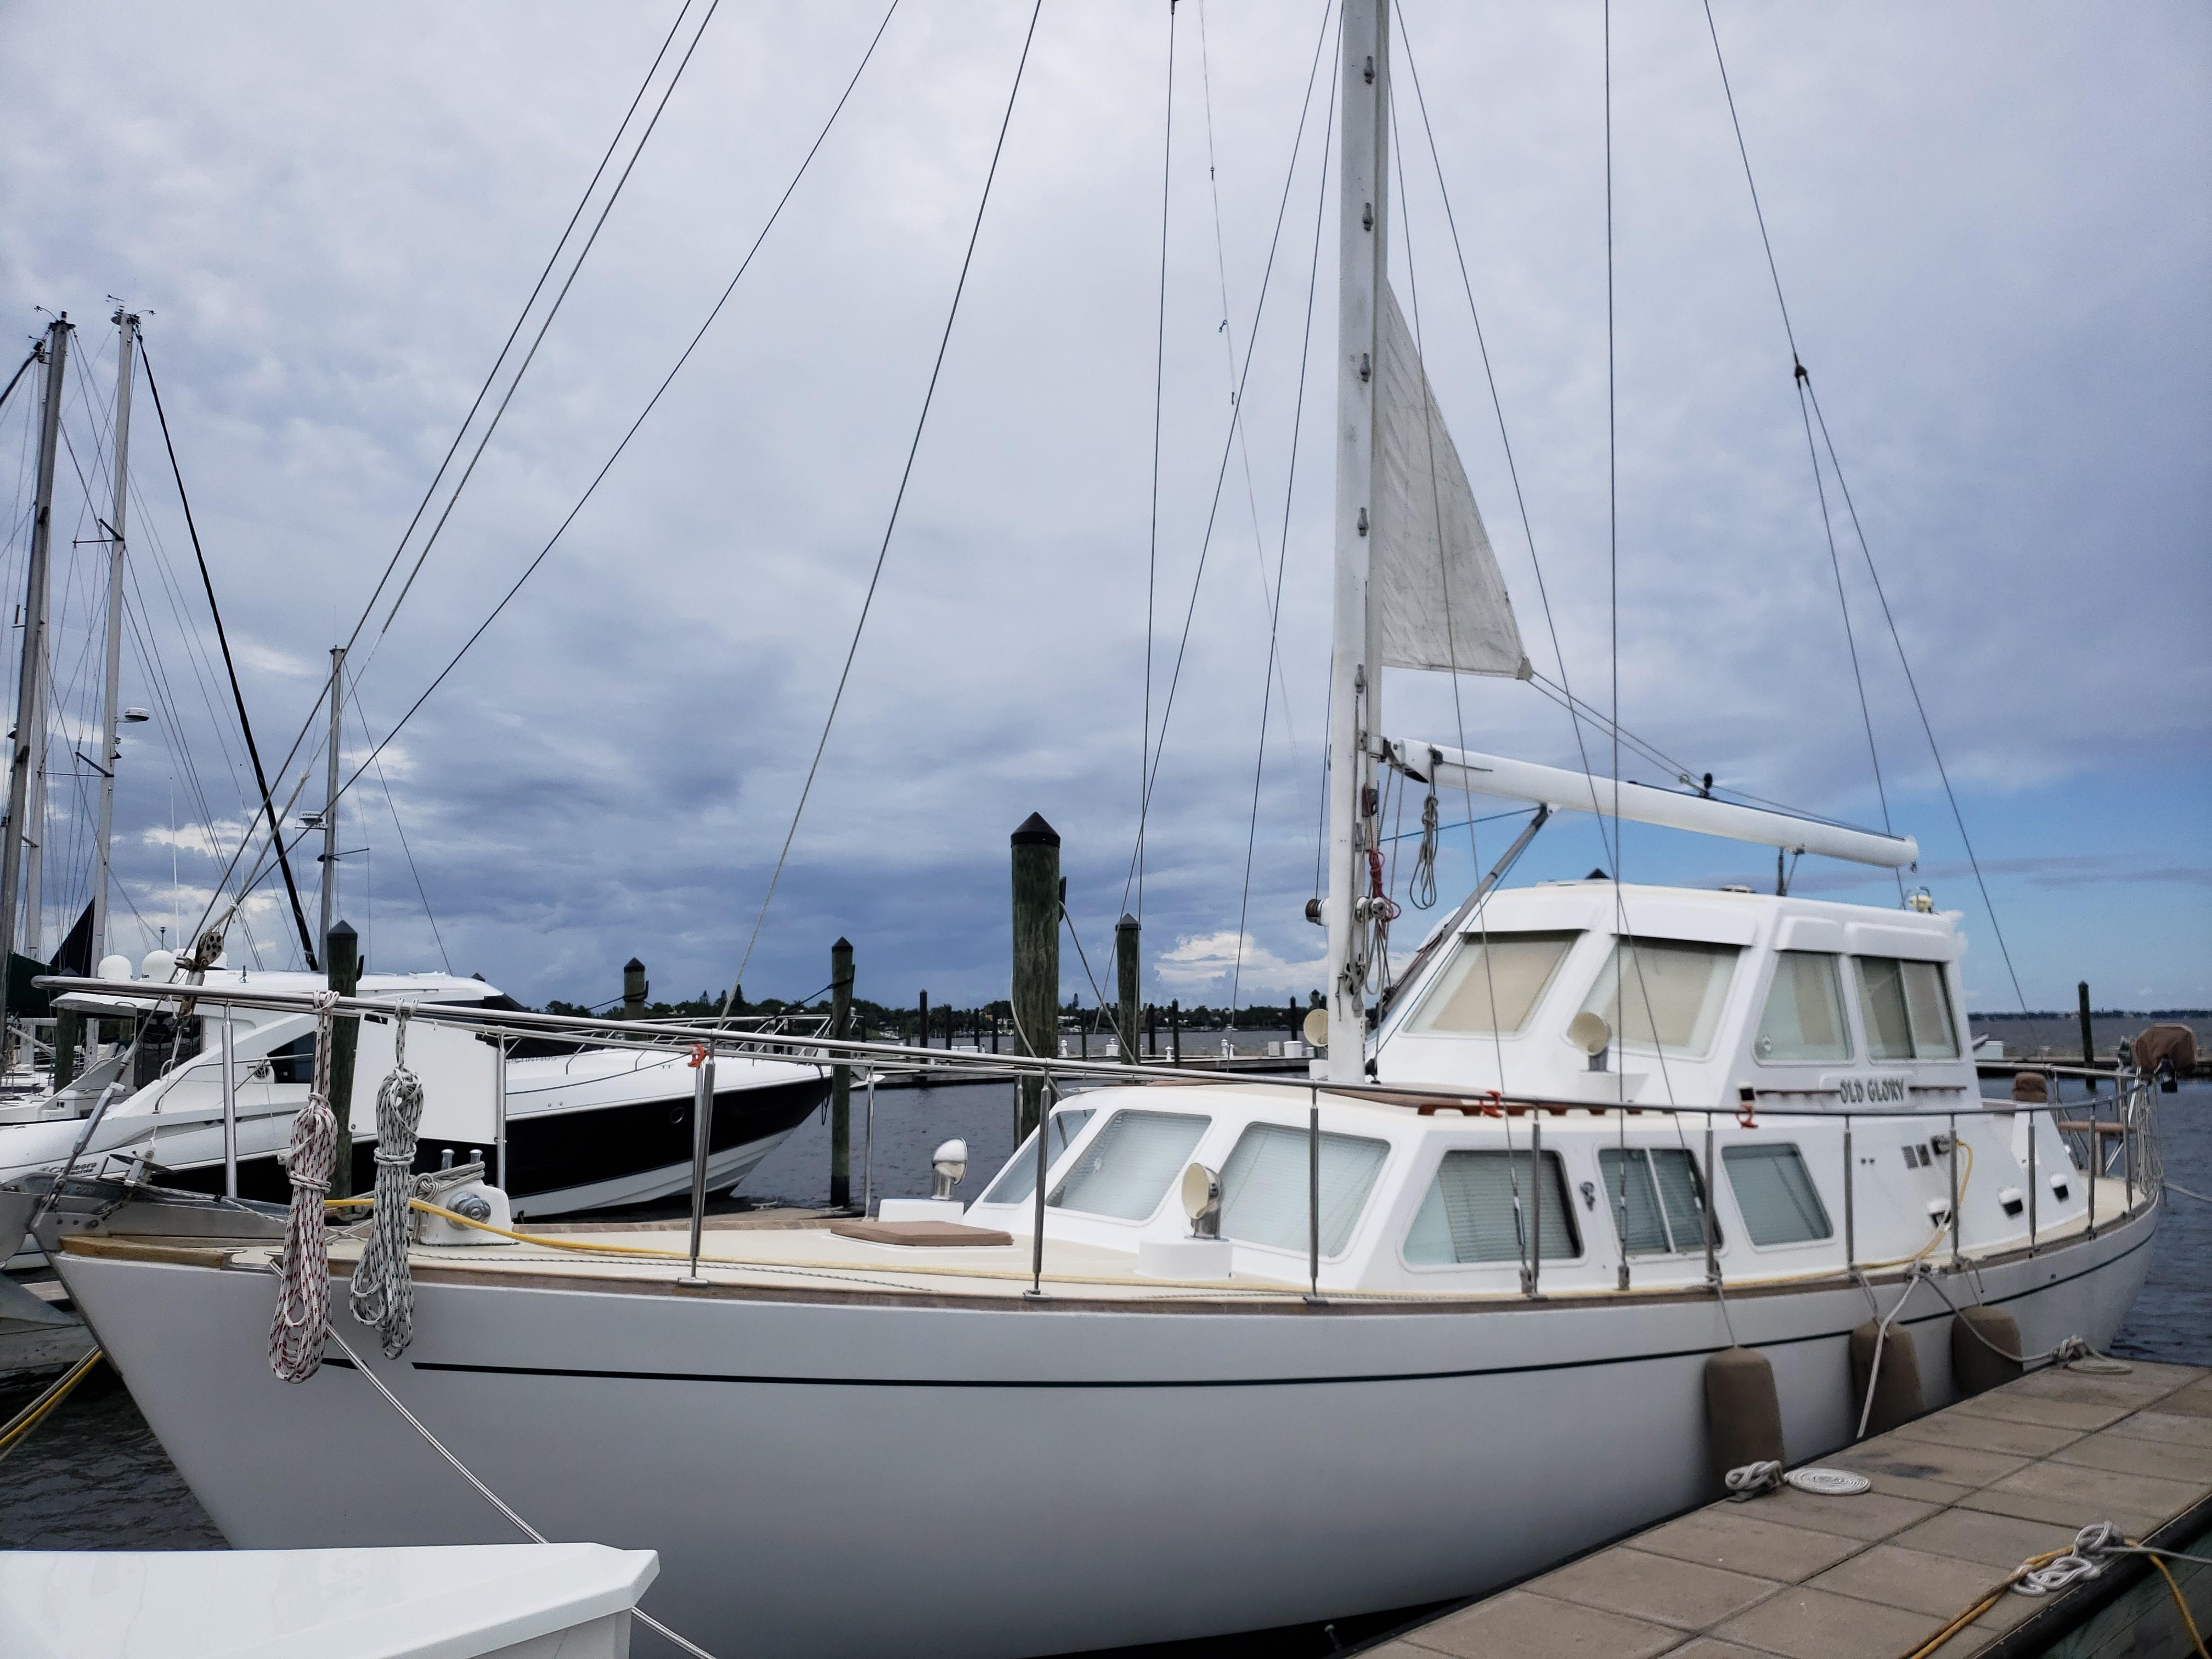 46 CAL Old Glory 1975 Stuart | Denison Yacht Sales